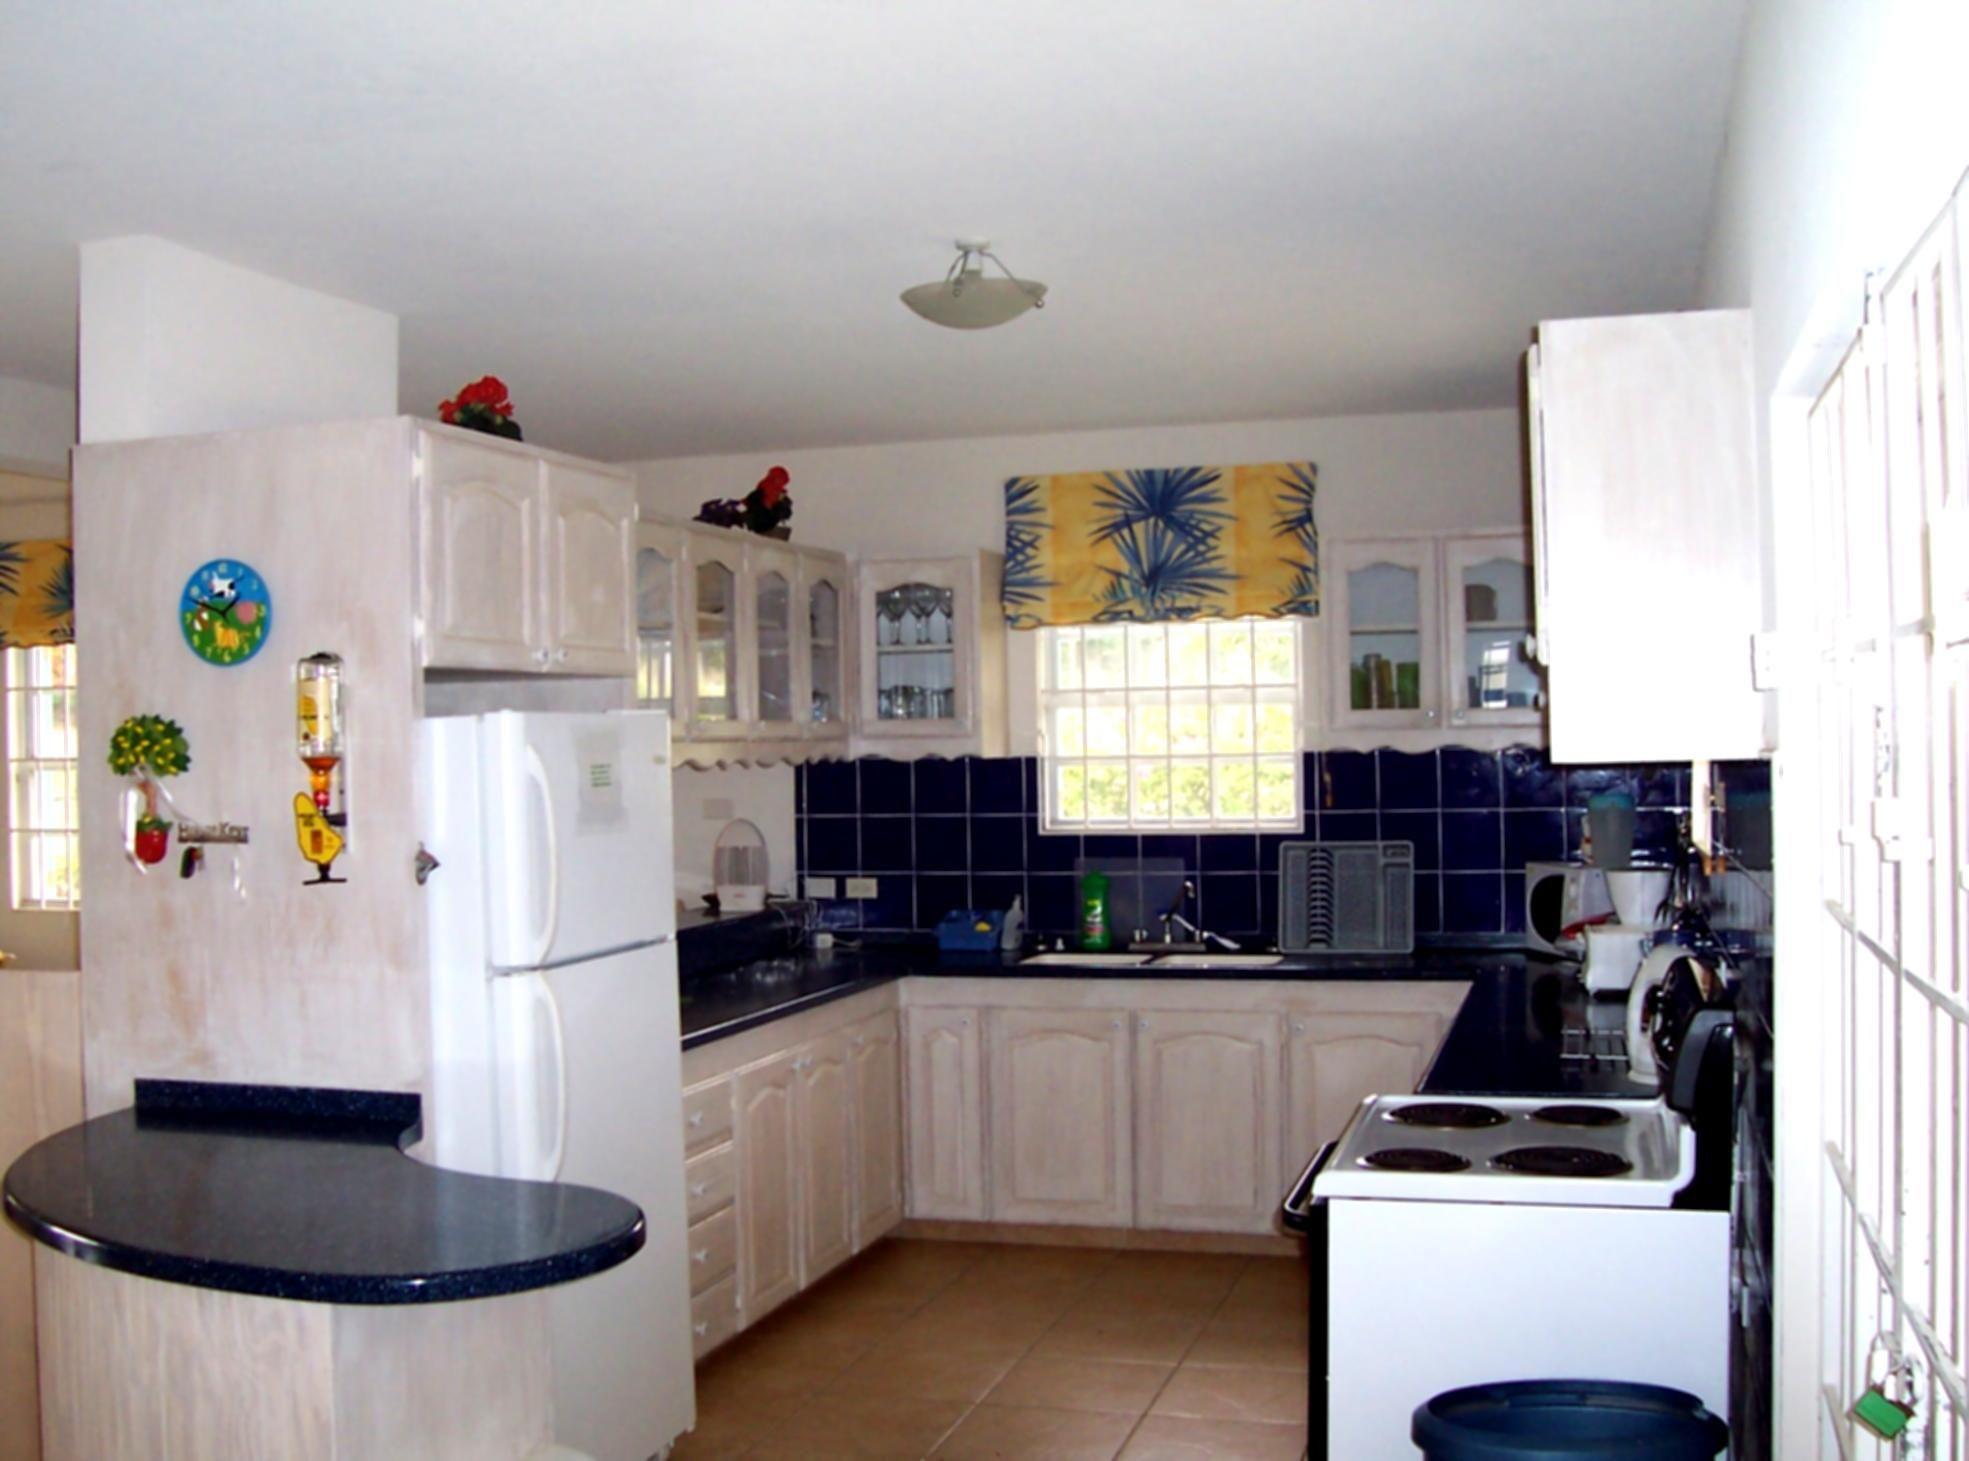 kitchen-simple-kitchen-model-simple-kitchens-simple ... on Model Kitchen Ideas  id=16368